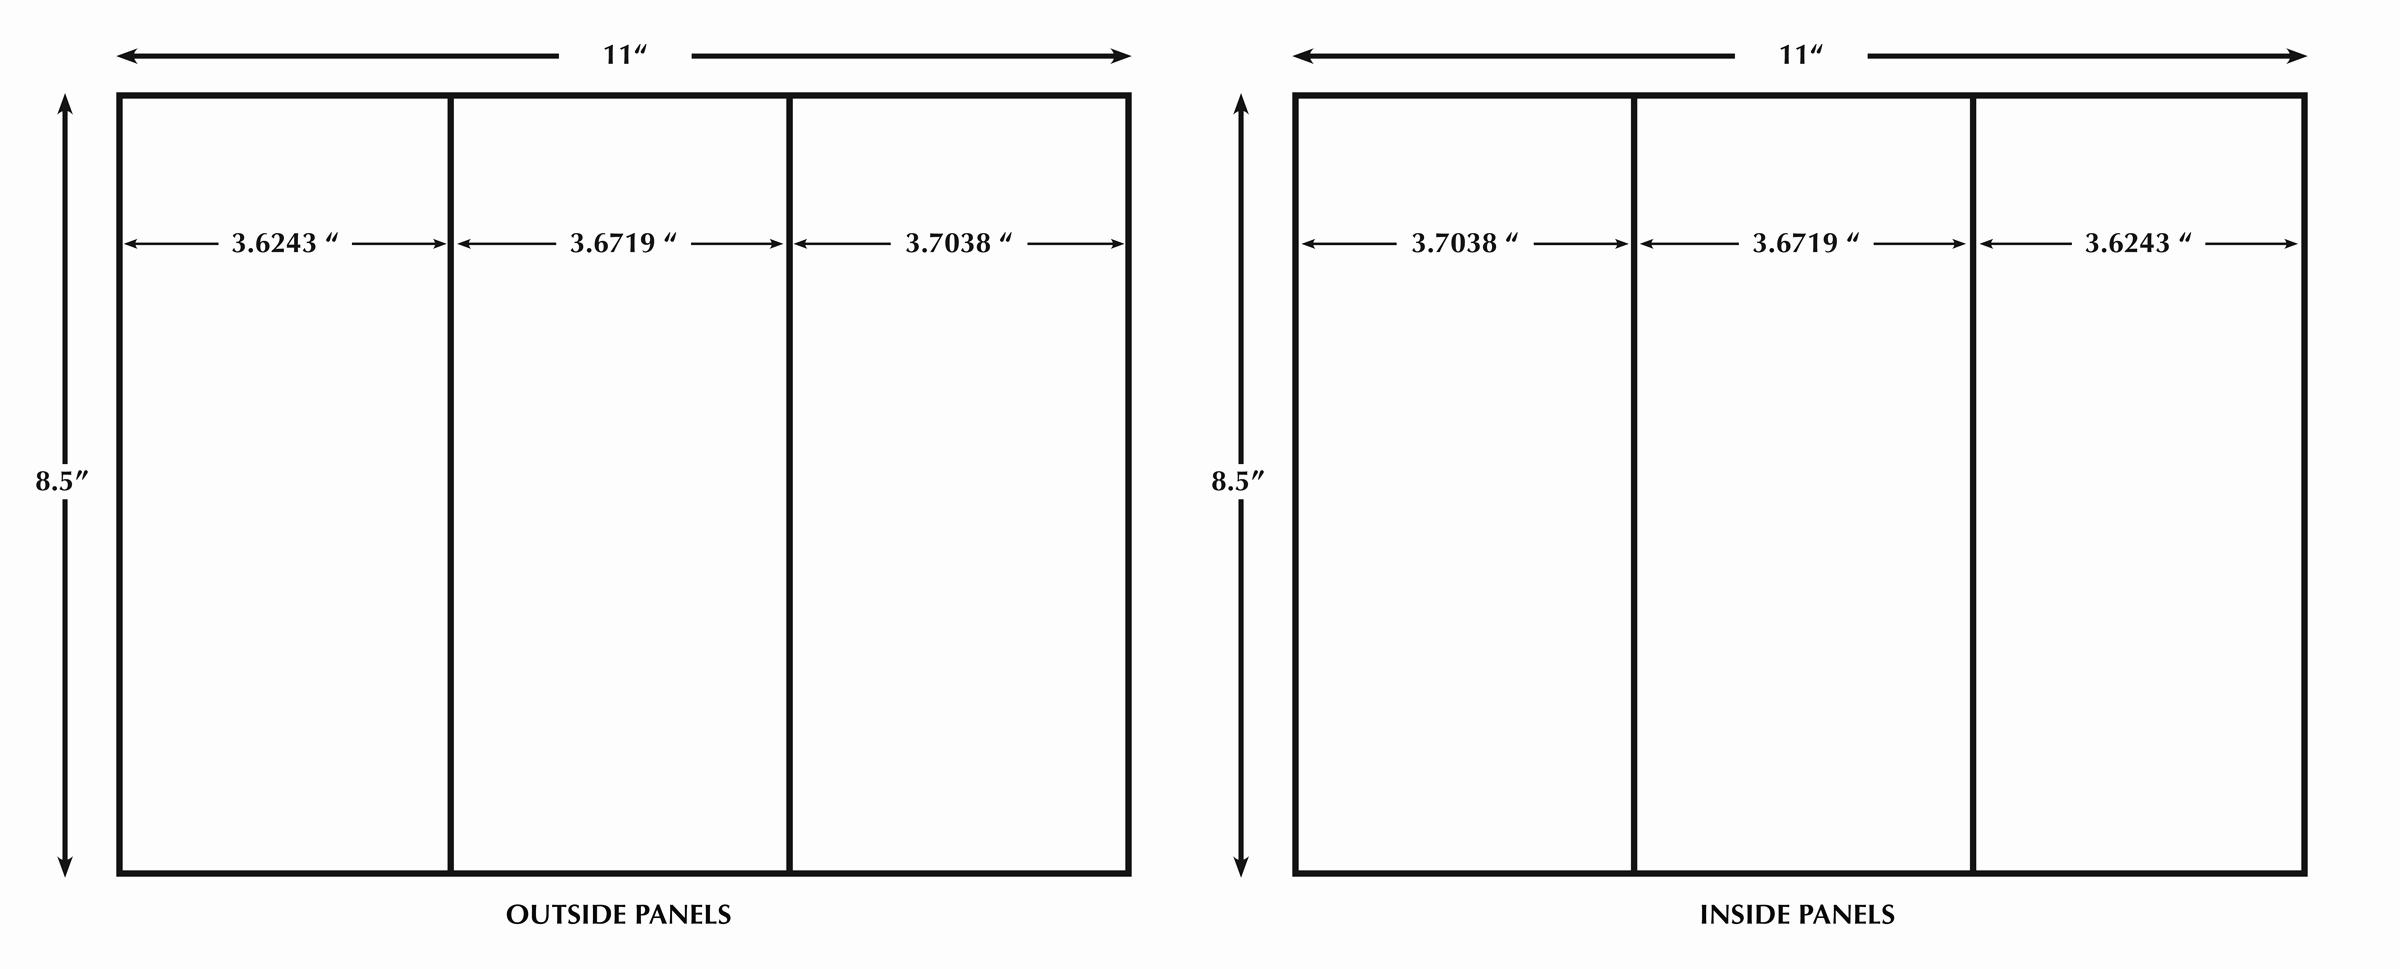 Size Of Tri Fold Brochure Elegant 13 Best S Of Indesign Tri Fold Brochure Size Free